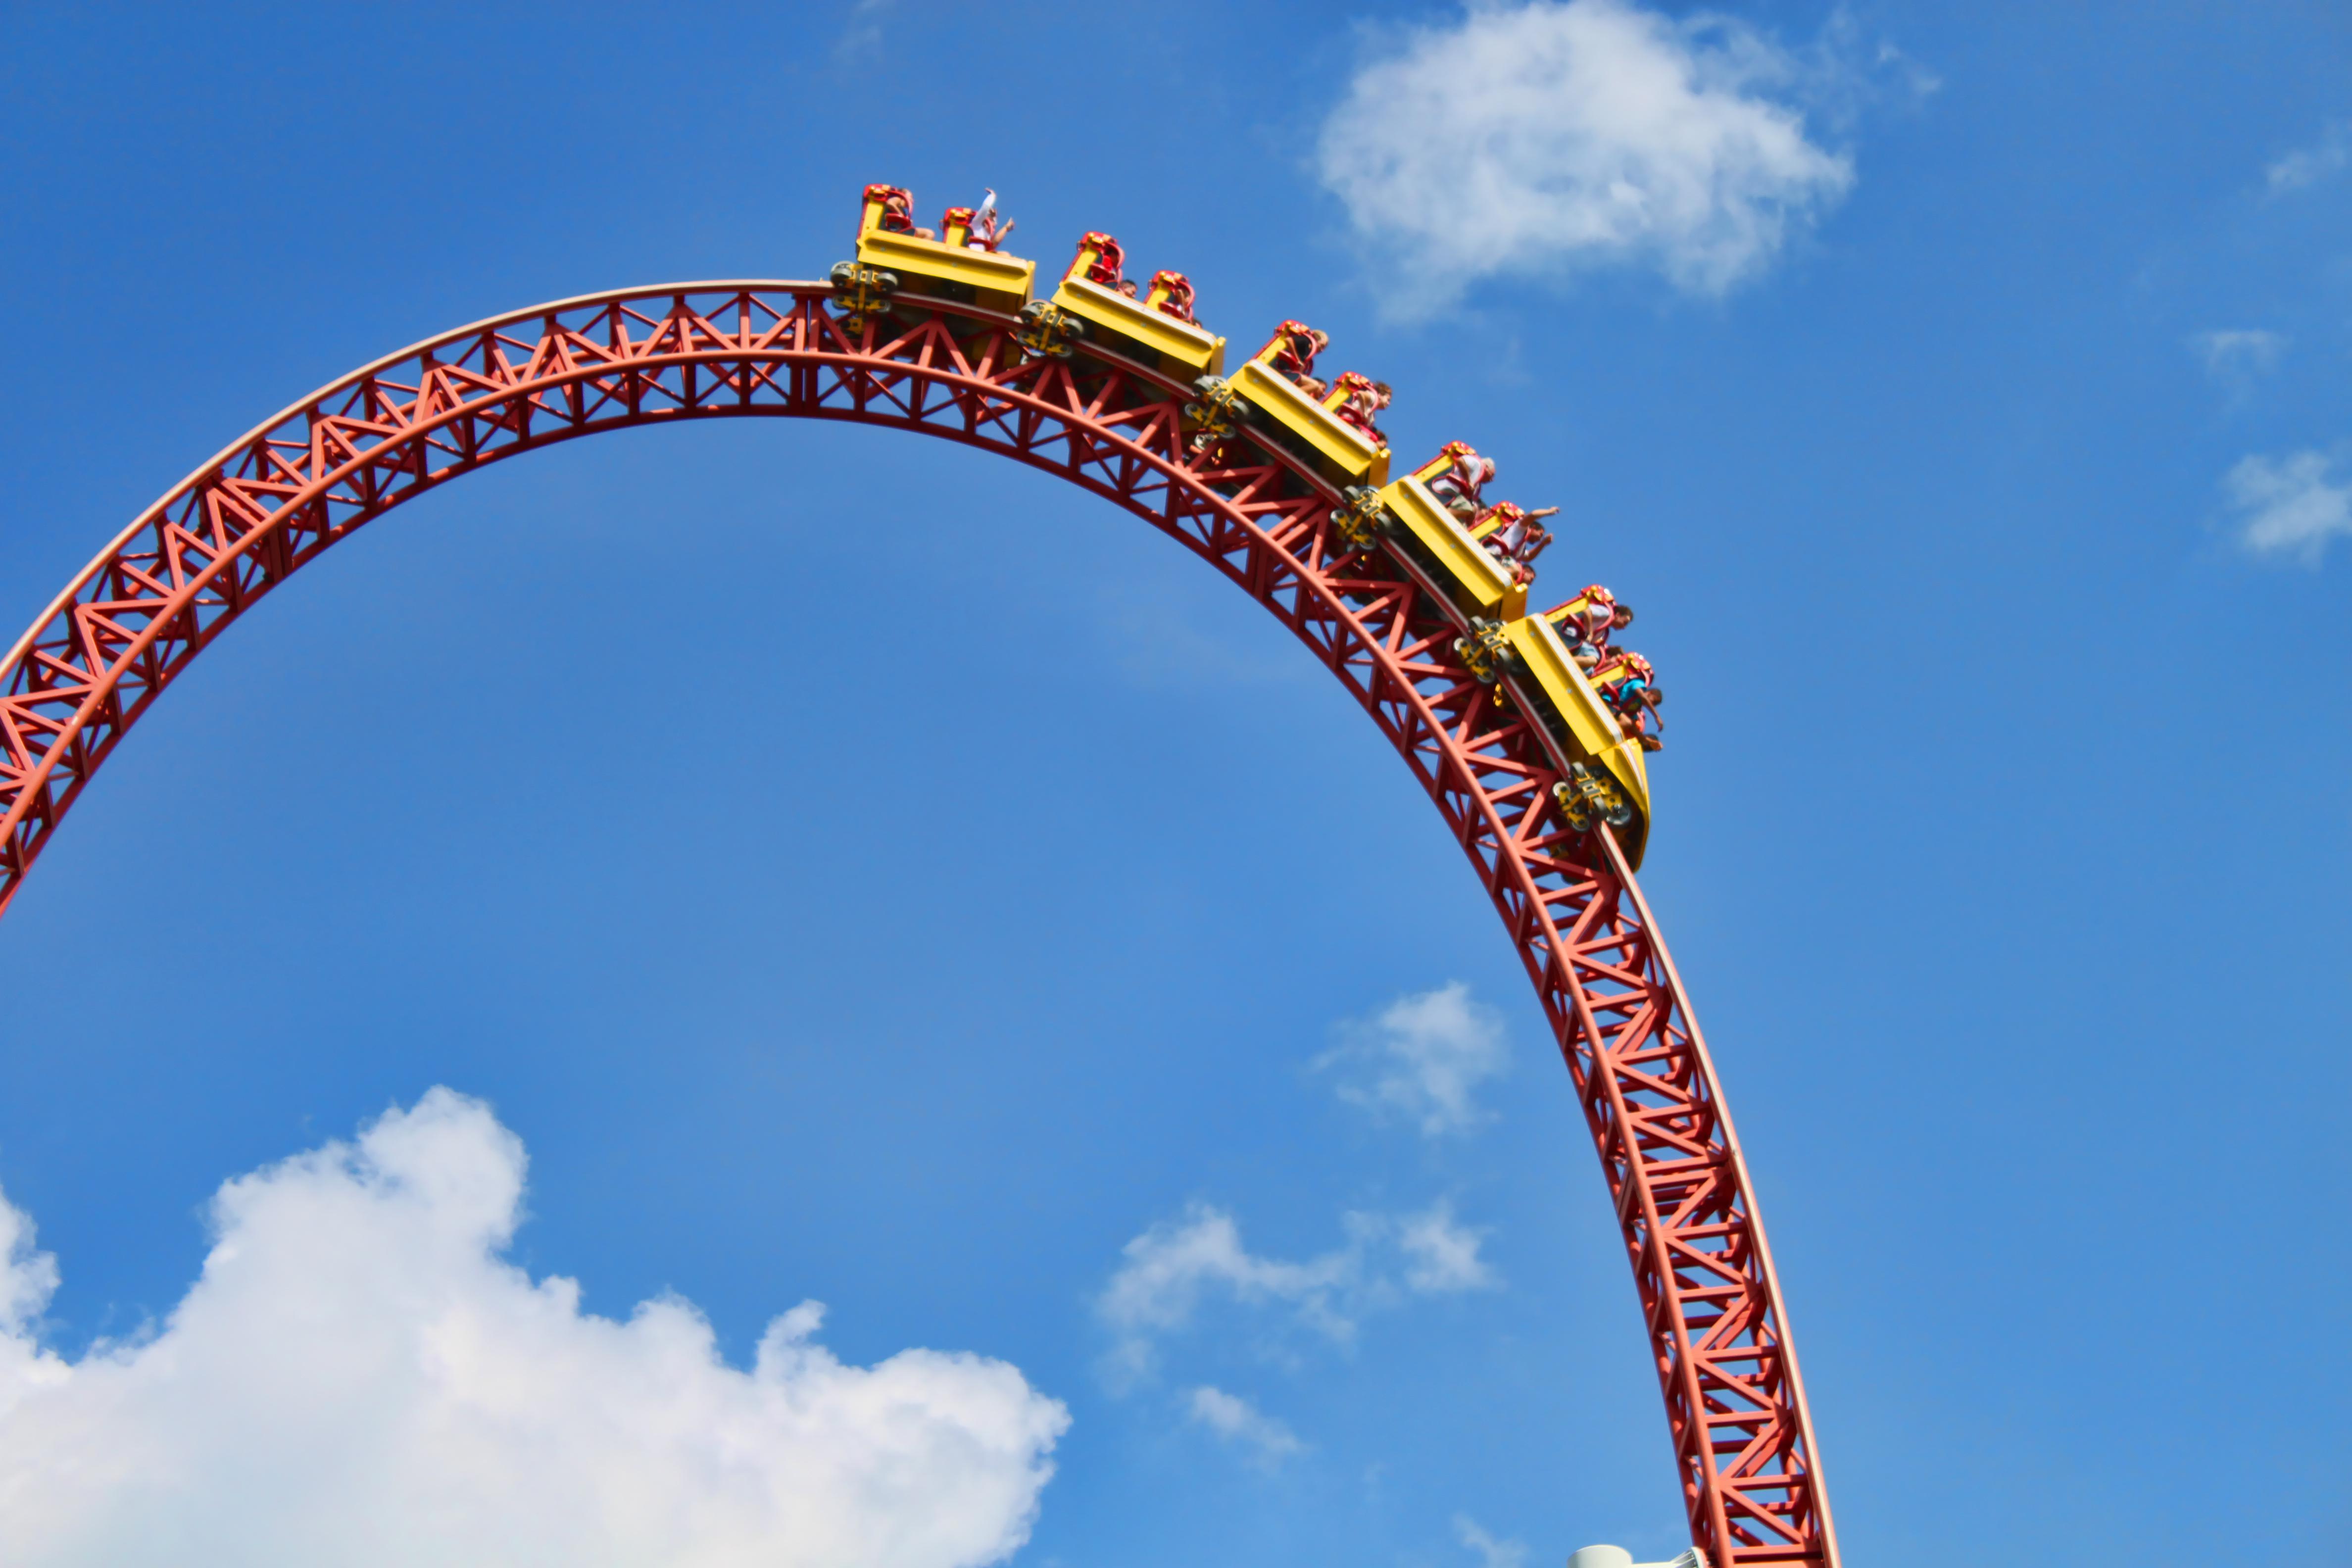 Storm Runner Roller Coaster